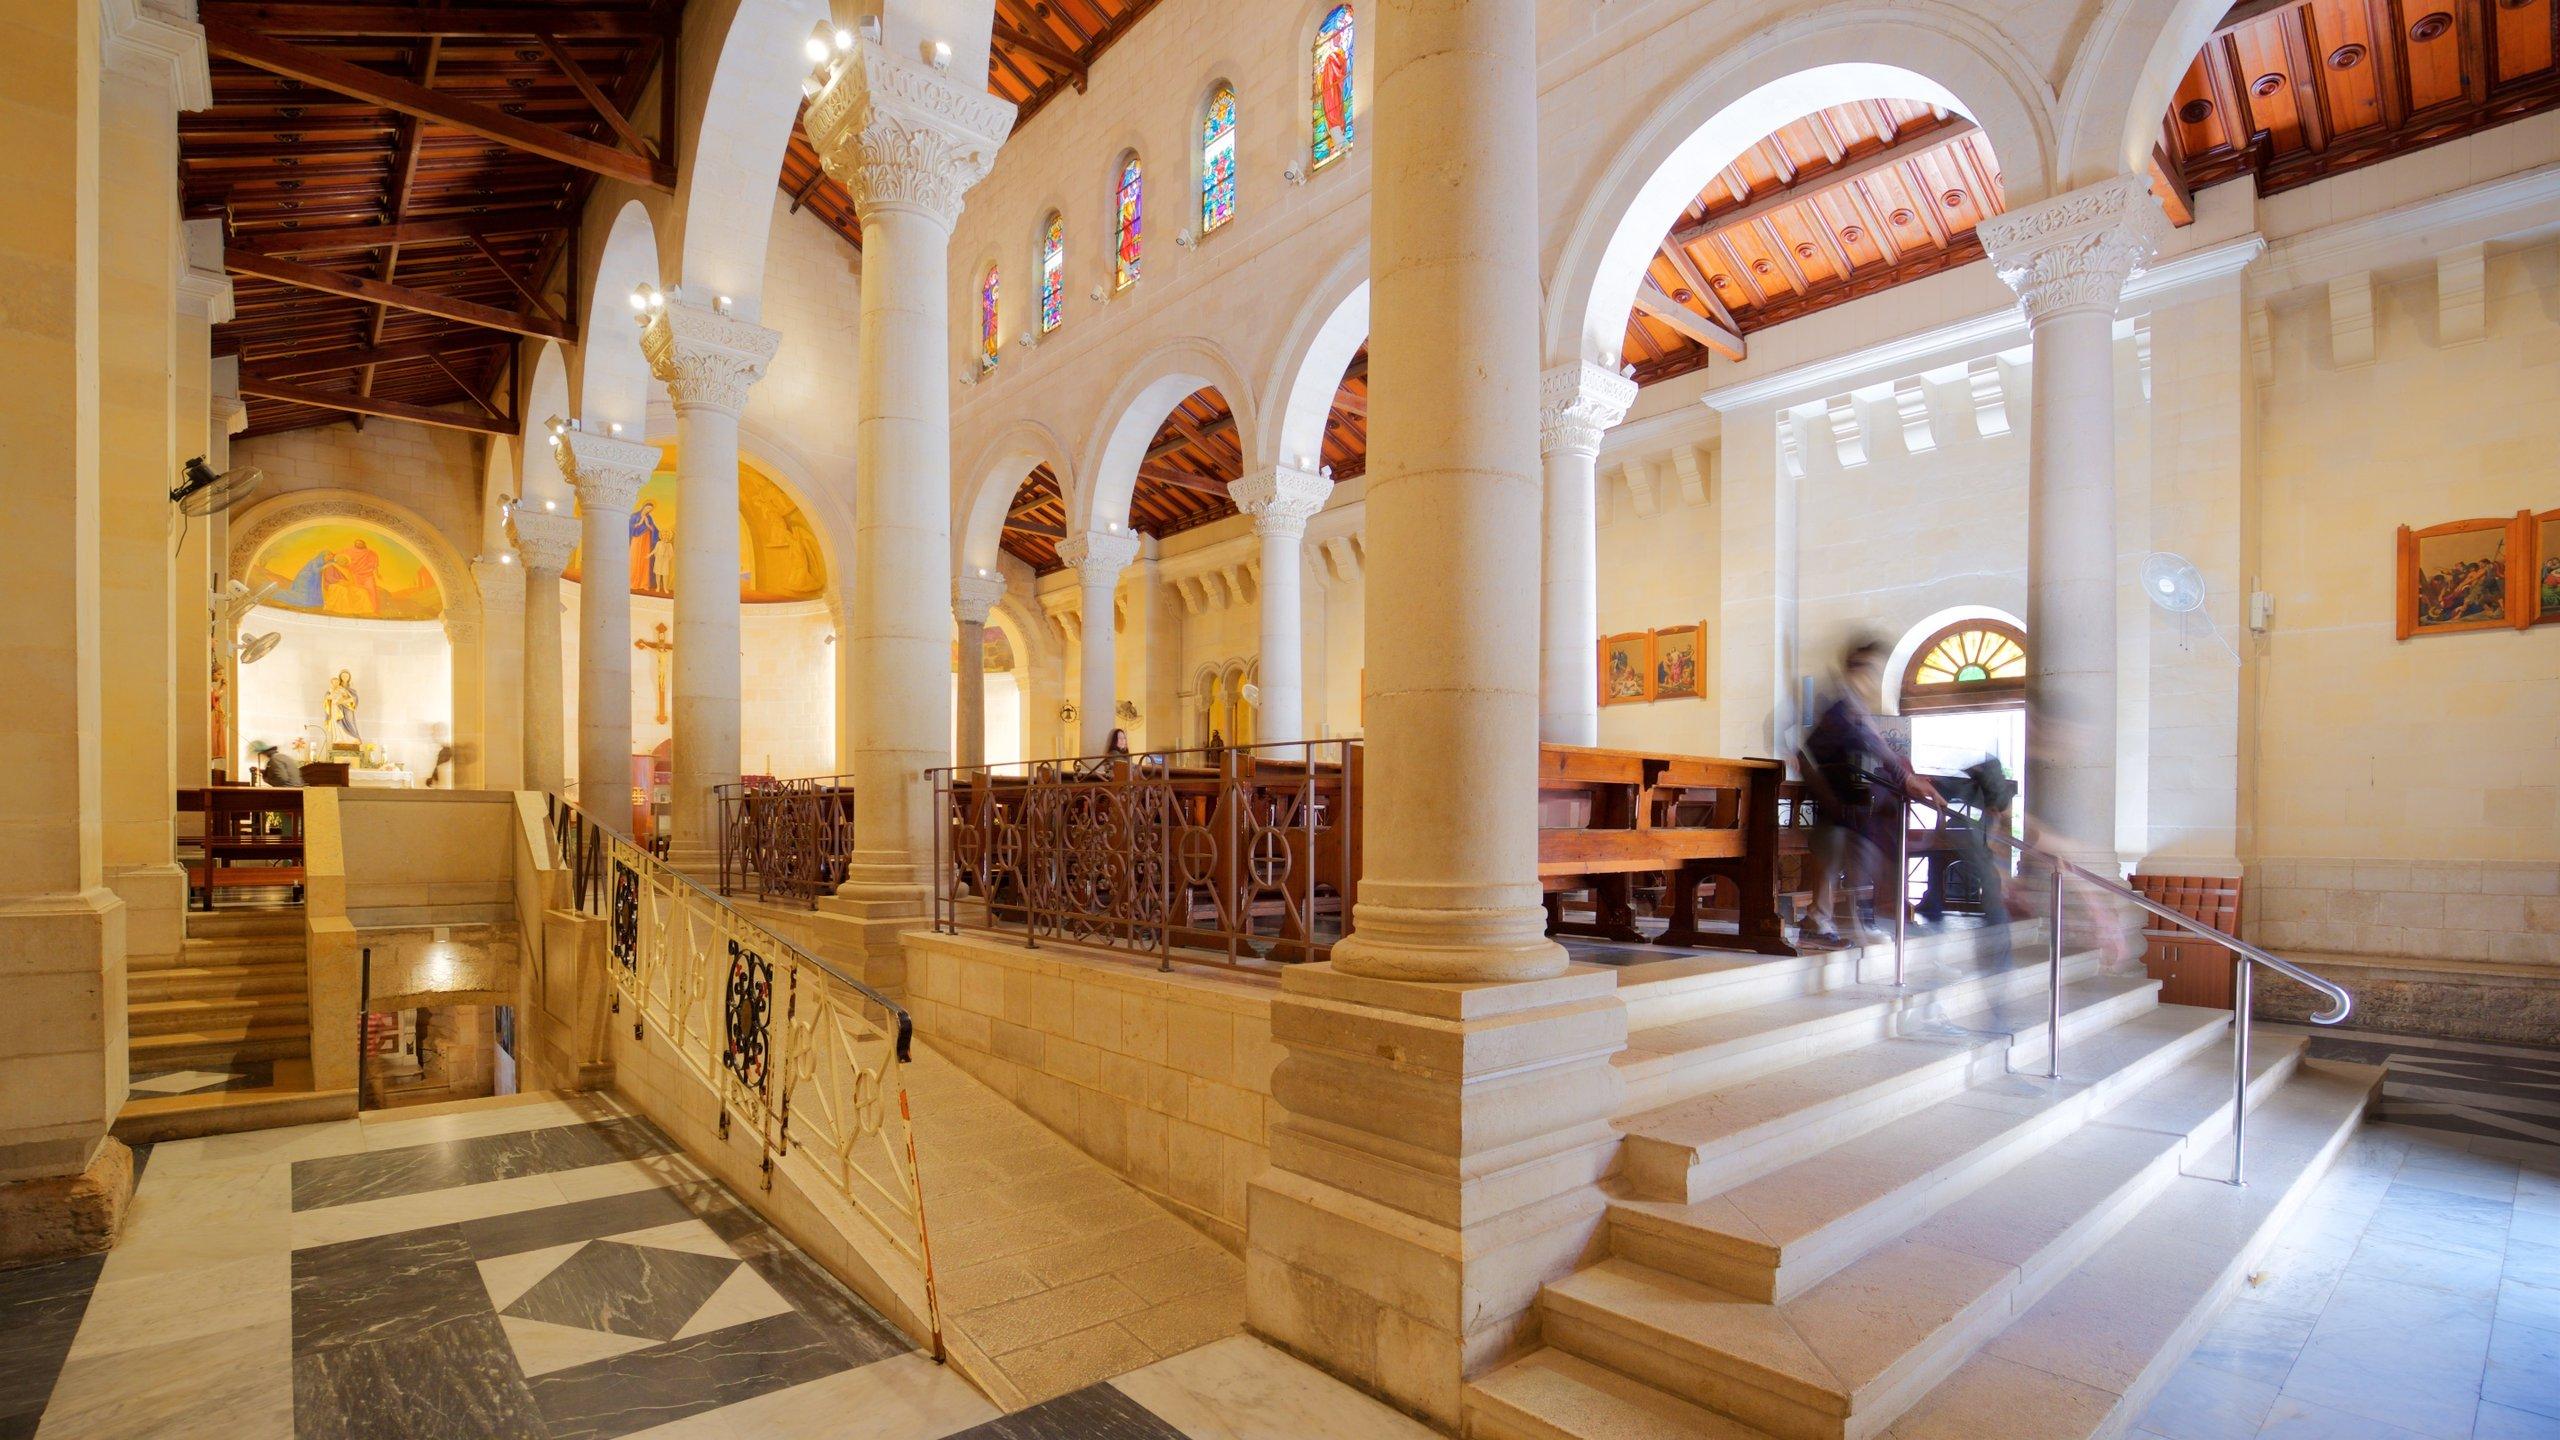 St. Joseph's Church, Nazareth, Northern District, Israel